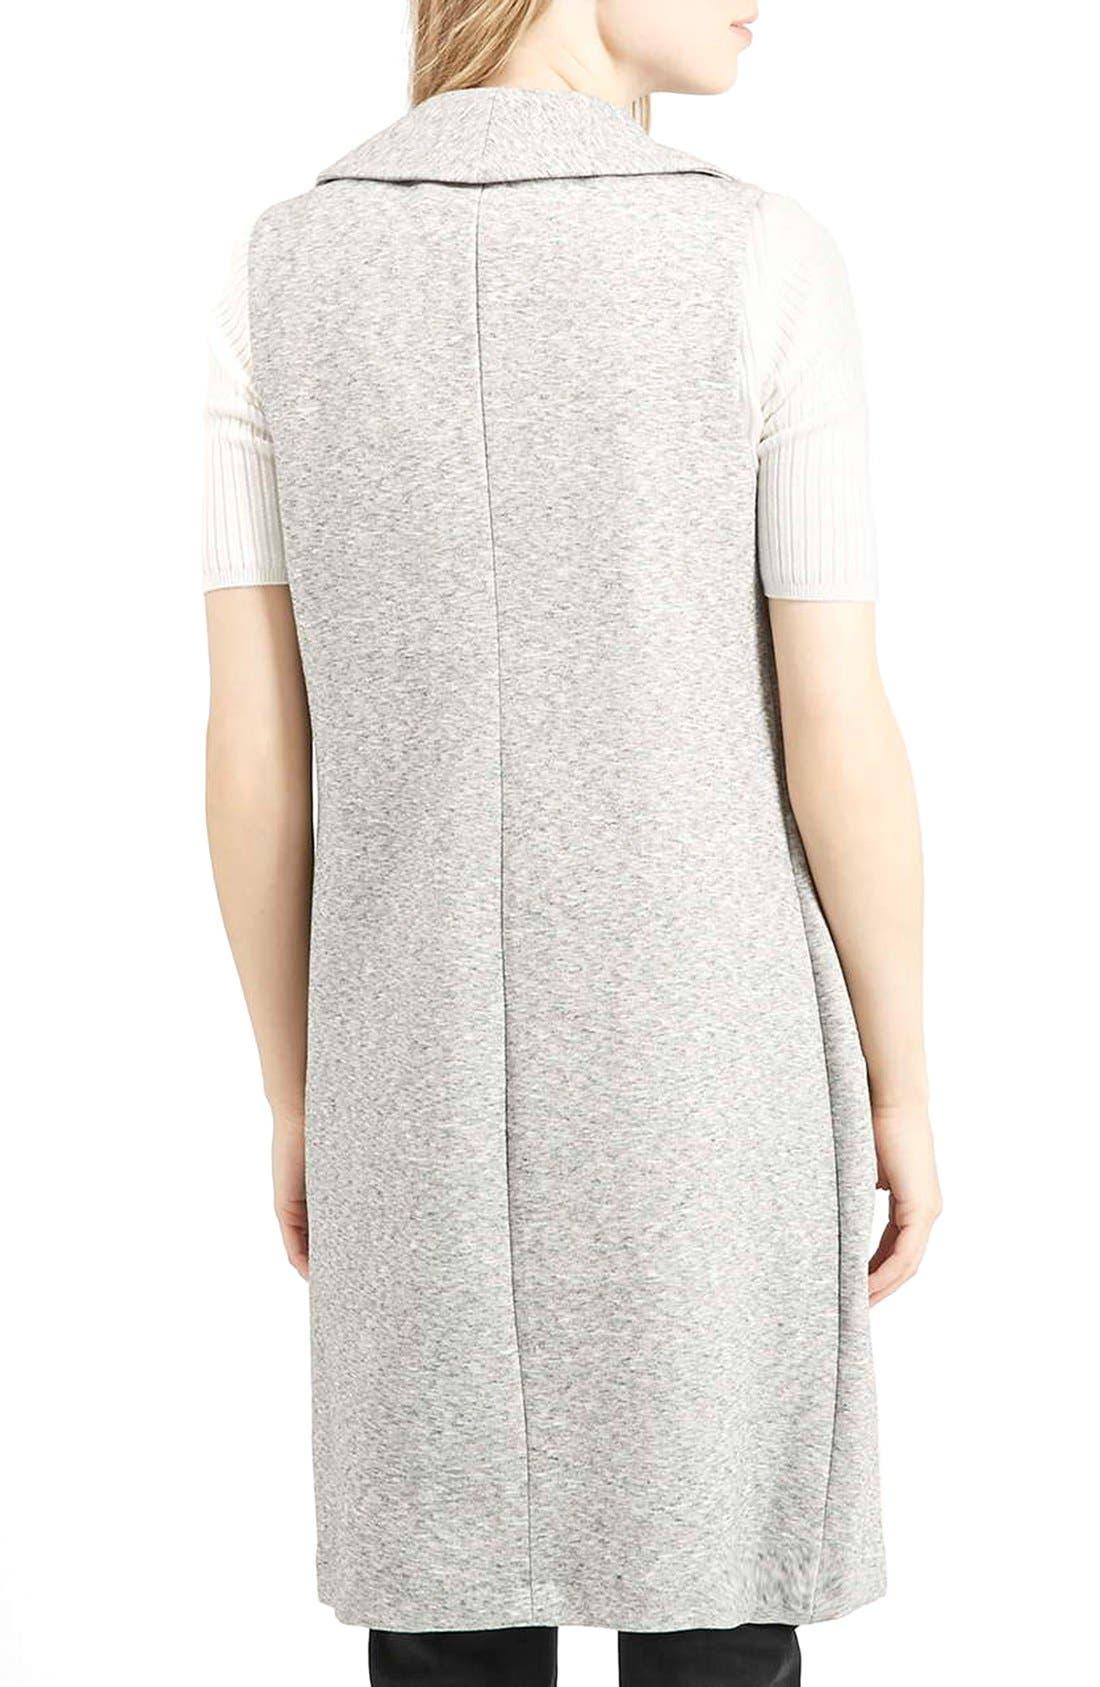 Marled Longline Vest,                             Alternate thumbnail 3, color,                             Light Grey